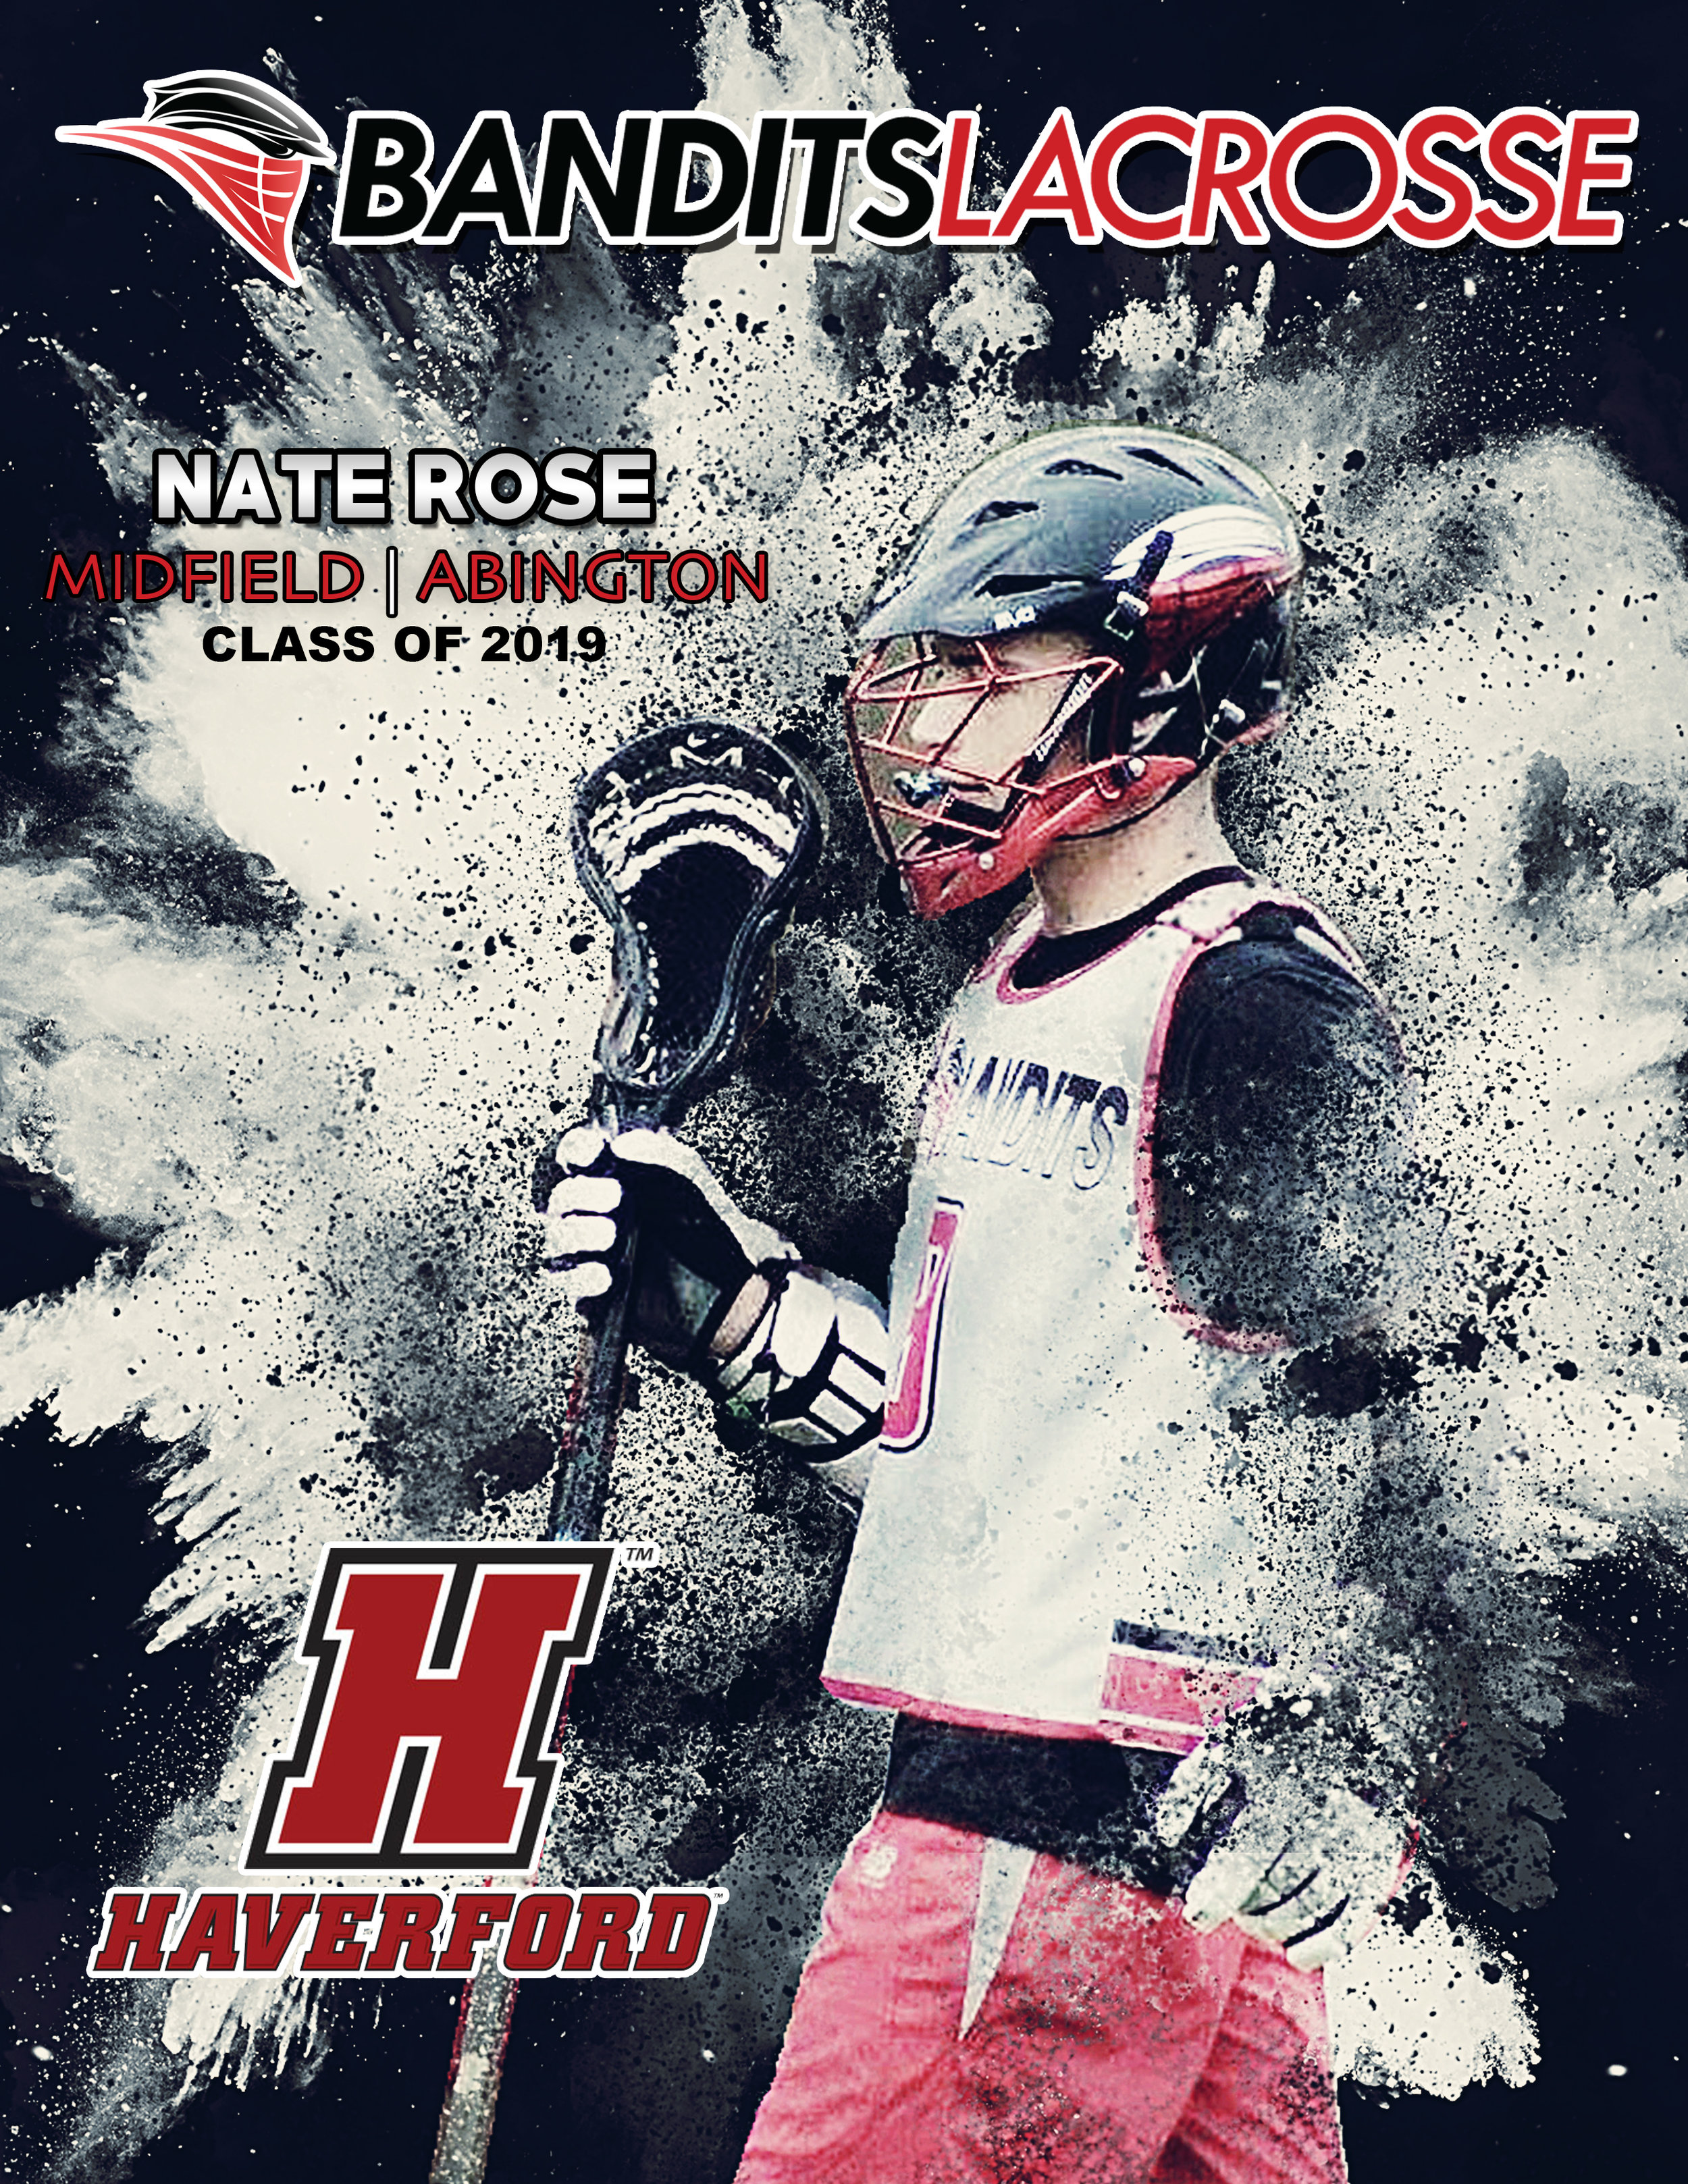 Bandits Lacrosse Commitment Poster - Nate Rose.jpg